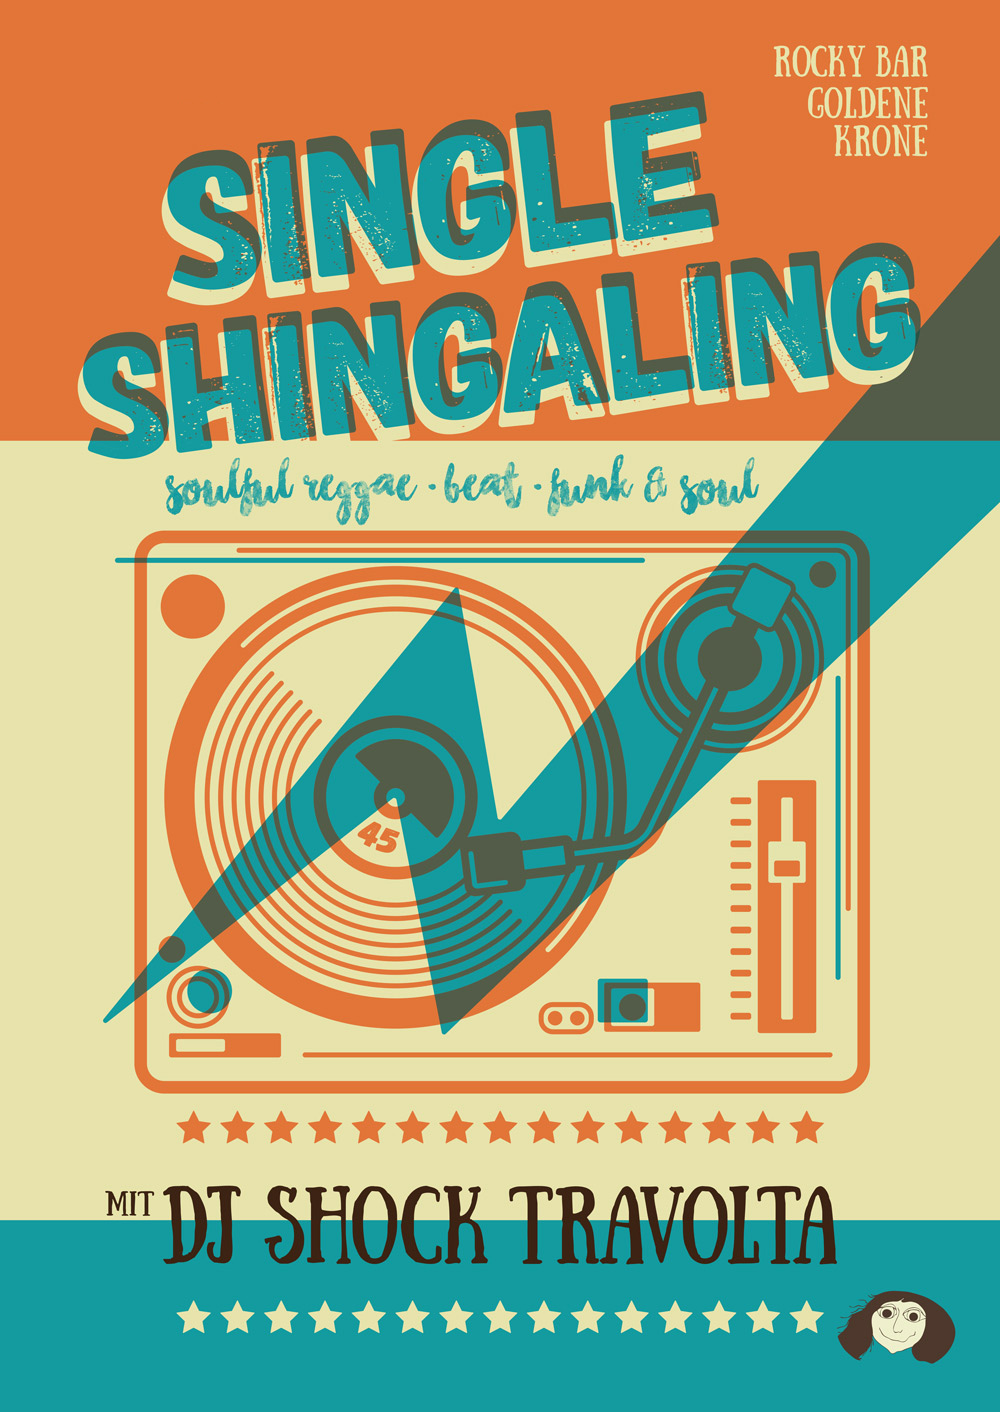 Singleshingaling